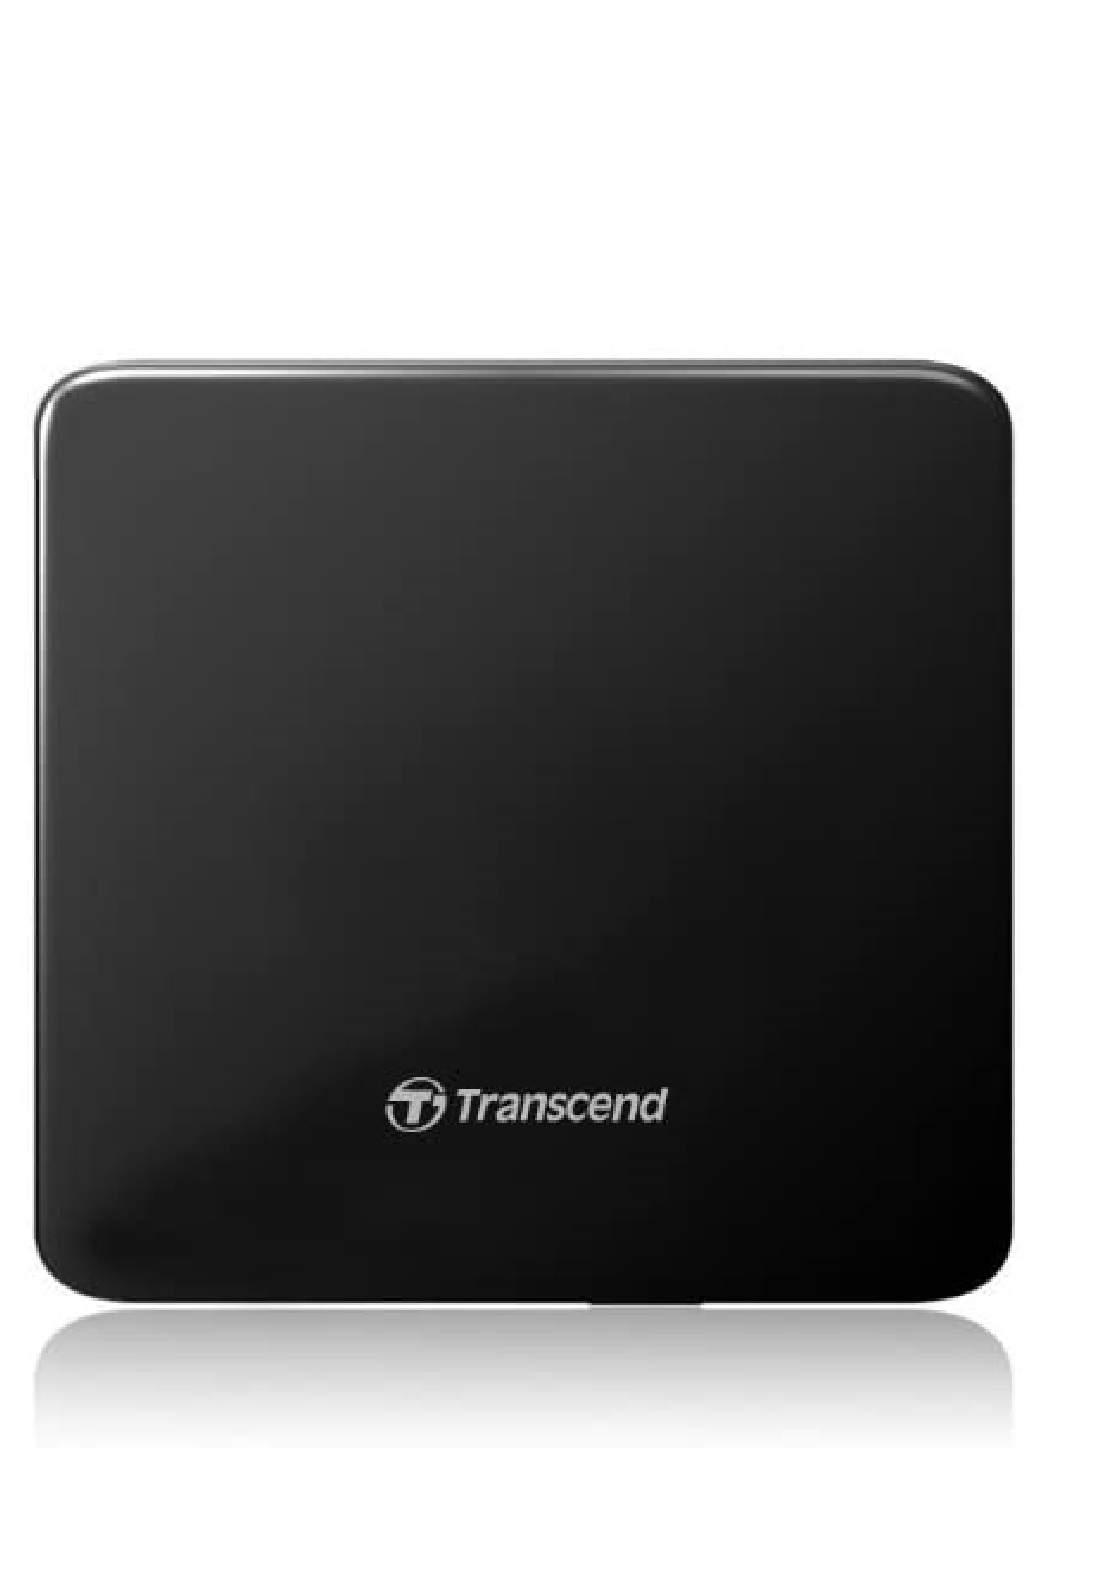 Transcend  TS8XDVDS-K 8X  Slim Portable DVD Writer -Black